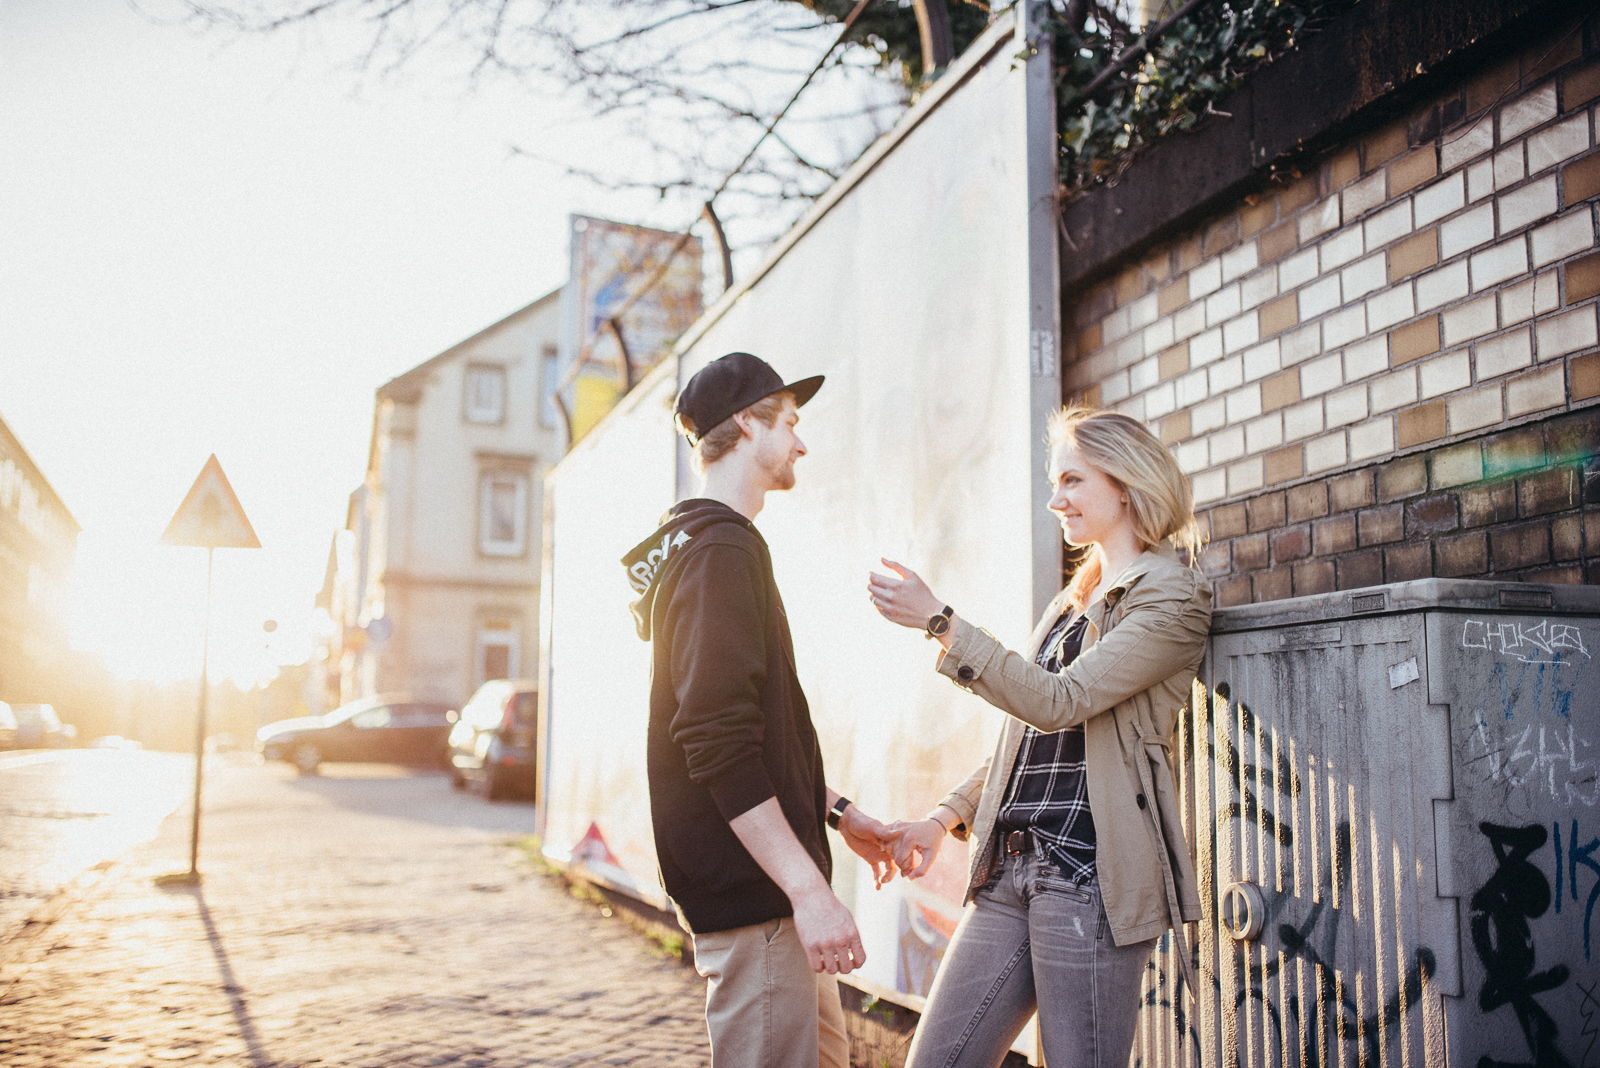 029-downtown-coupleshoot-witten-urbanes-paarshooting